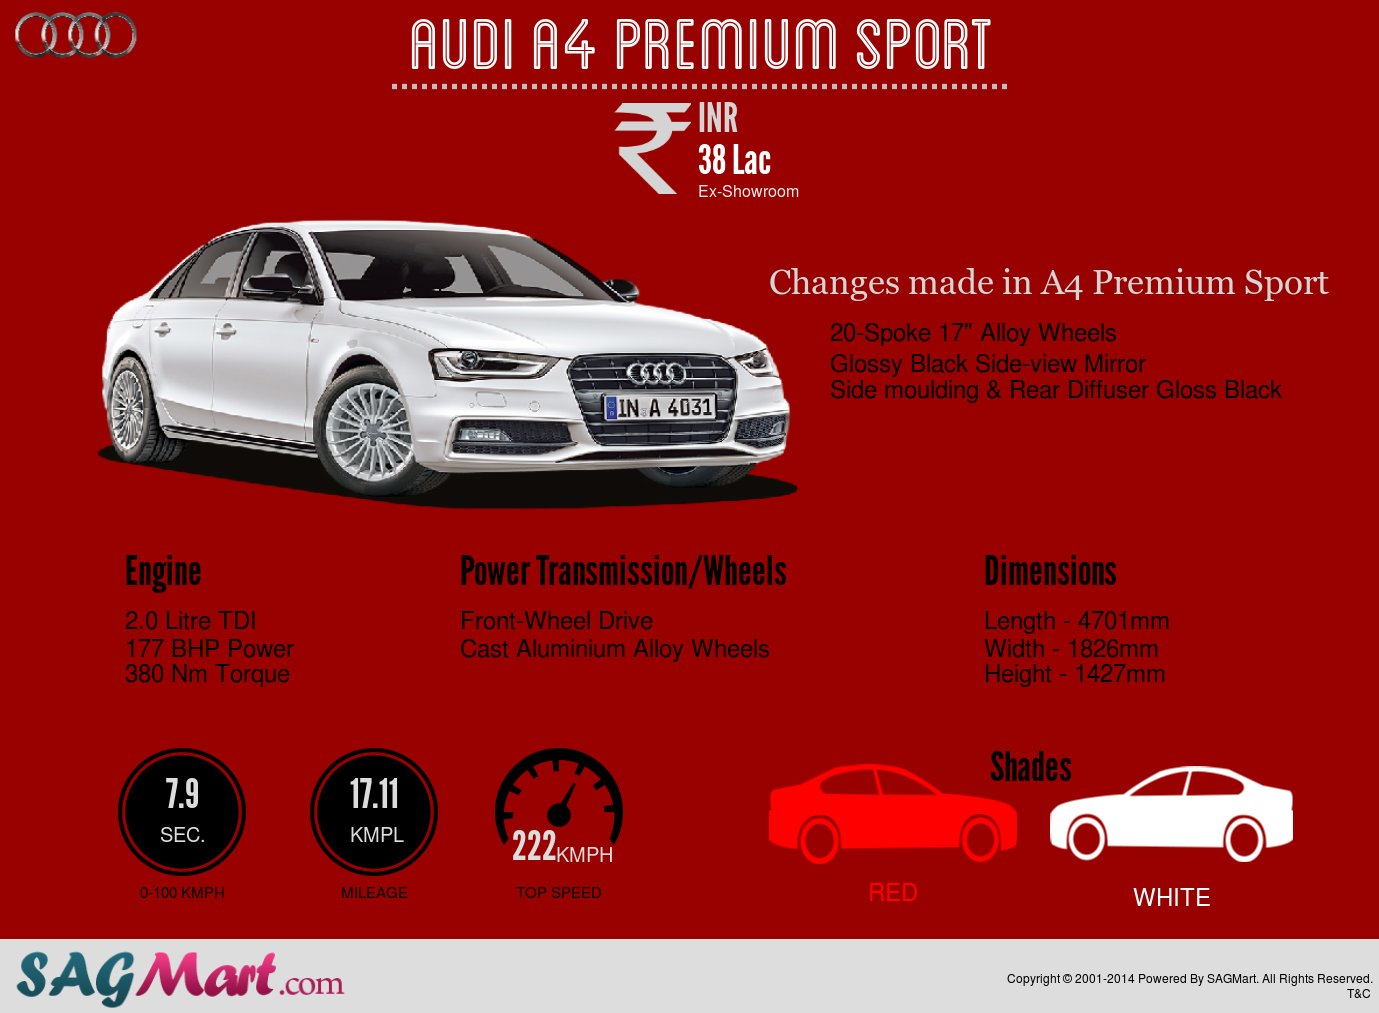 All New Audi A Premium Sport Specifications Infographic SAGMart - Audi a4 specs